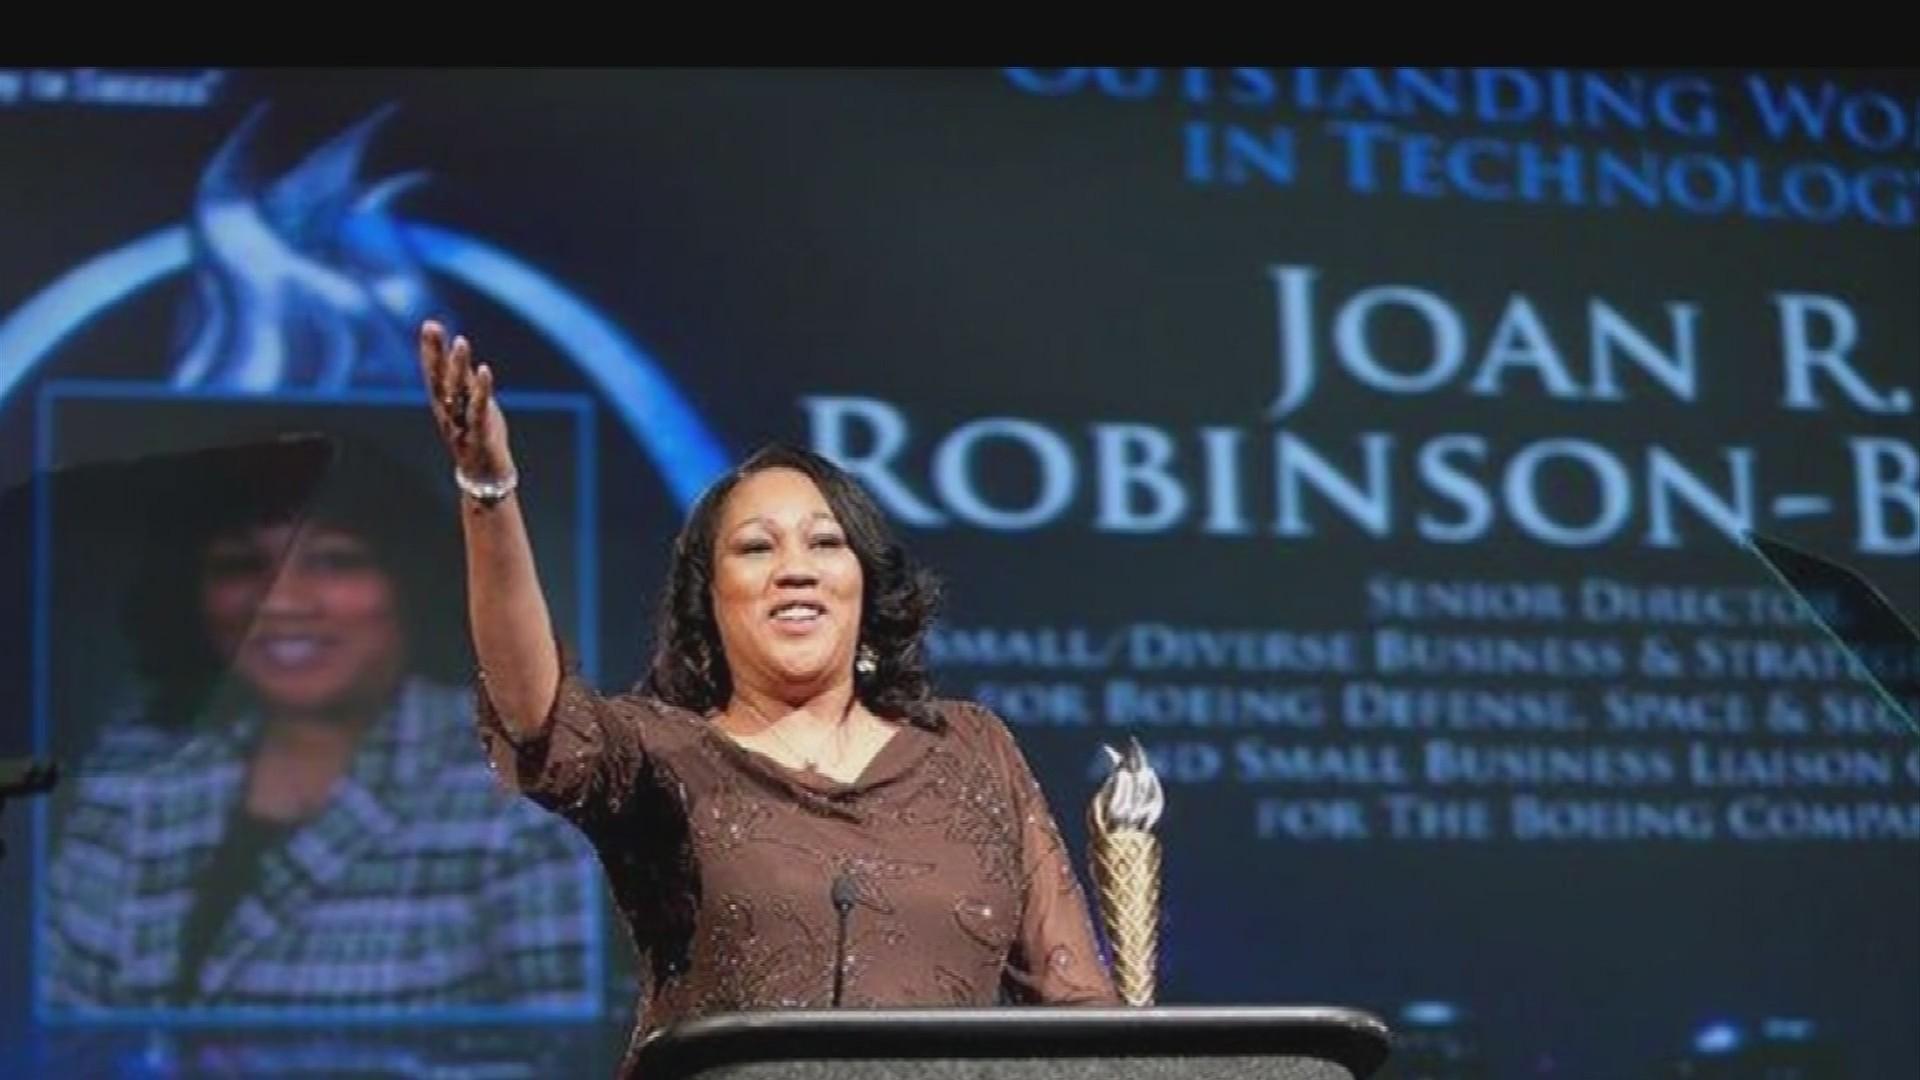 VIDEO: Boeing's Joan Robinson-Berry